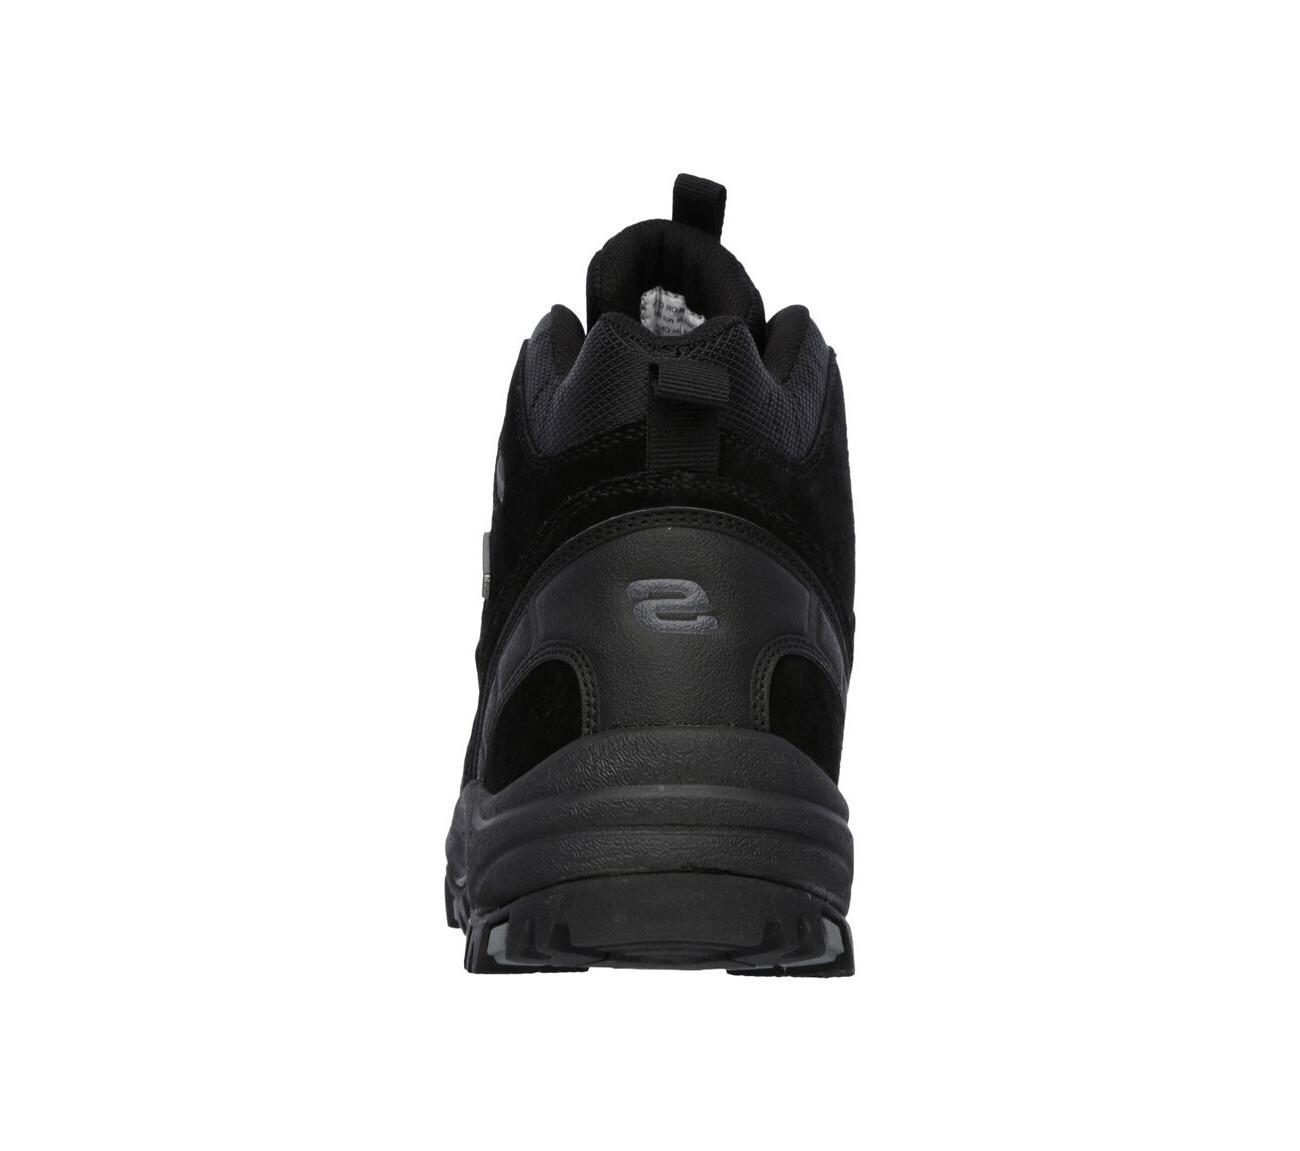 Men's SKECHERS Relaxed Fit: Relment - Boot, 64869 /BLK Black